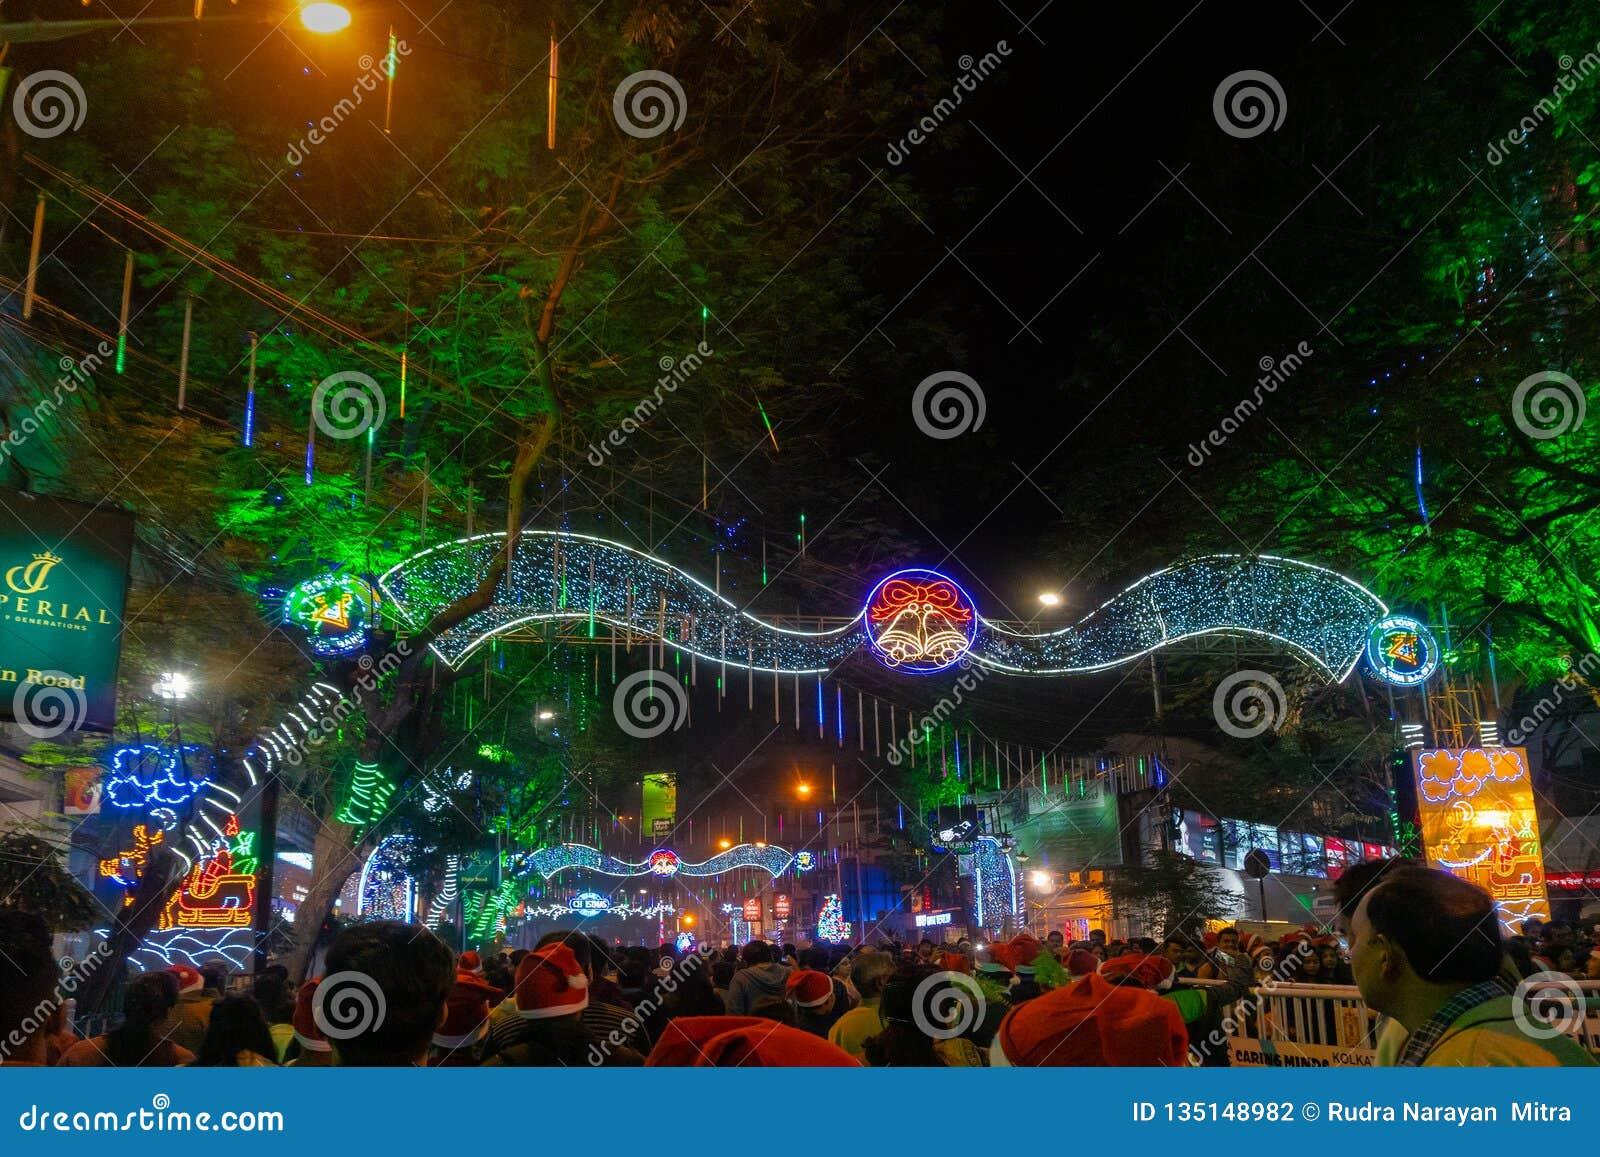 Park Street Kolkata During Christmas.Decorative Lighting At Park Street Kolkata Editorial